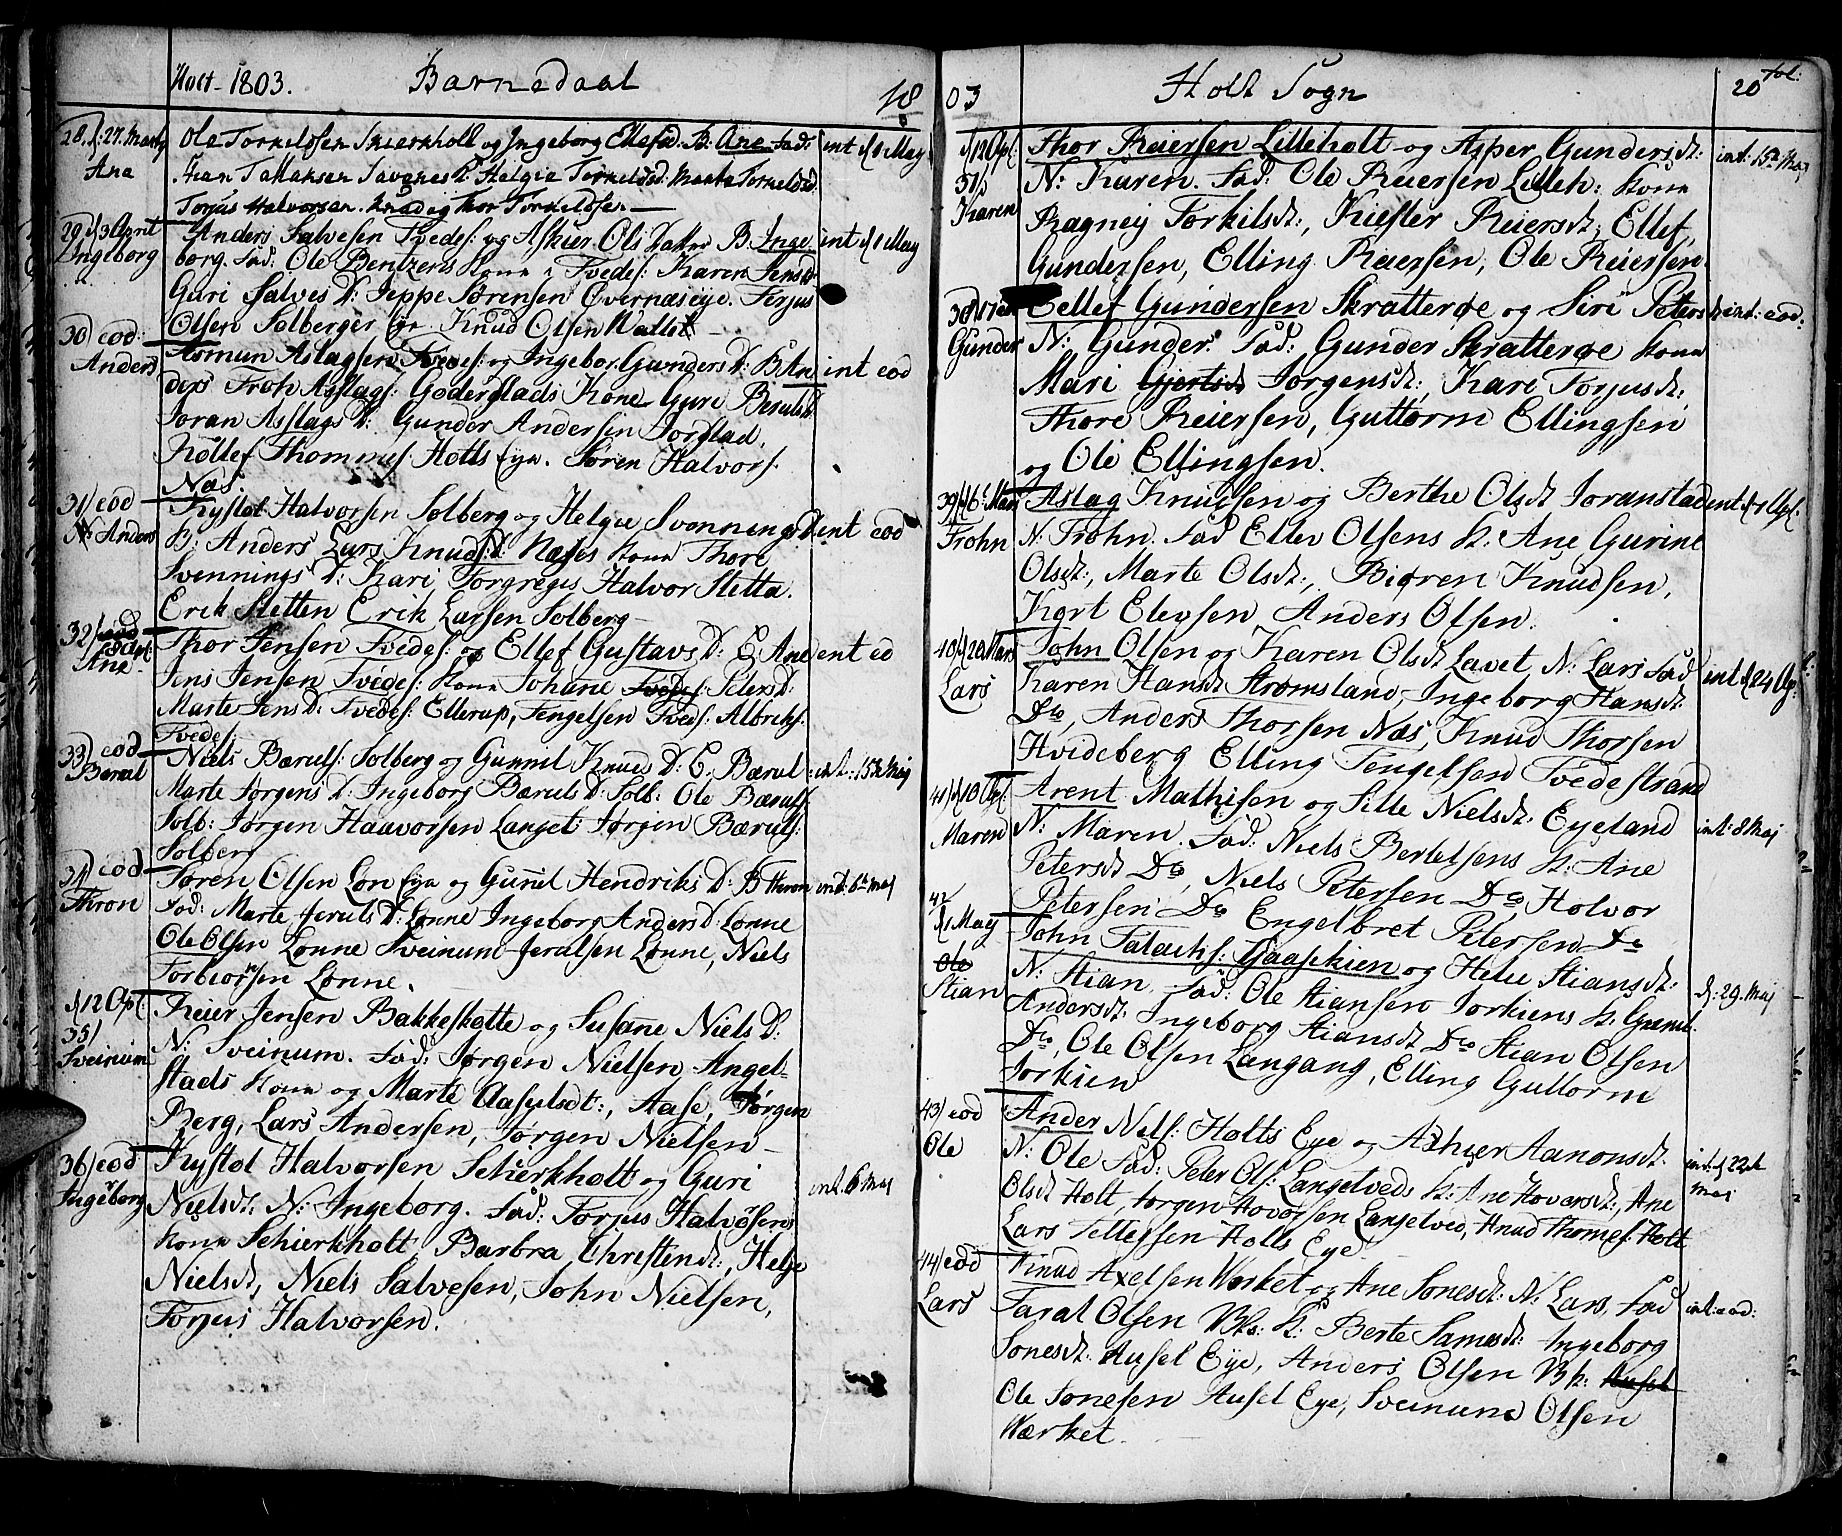 SAK, Holt sokneprestkontor, F/Fa/L0004: Ministerialbok nr. A 4, 1799-1813, s. 20